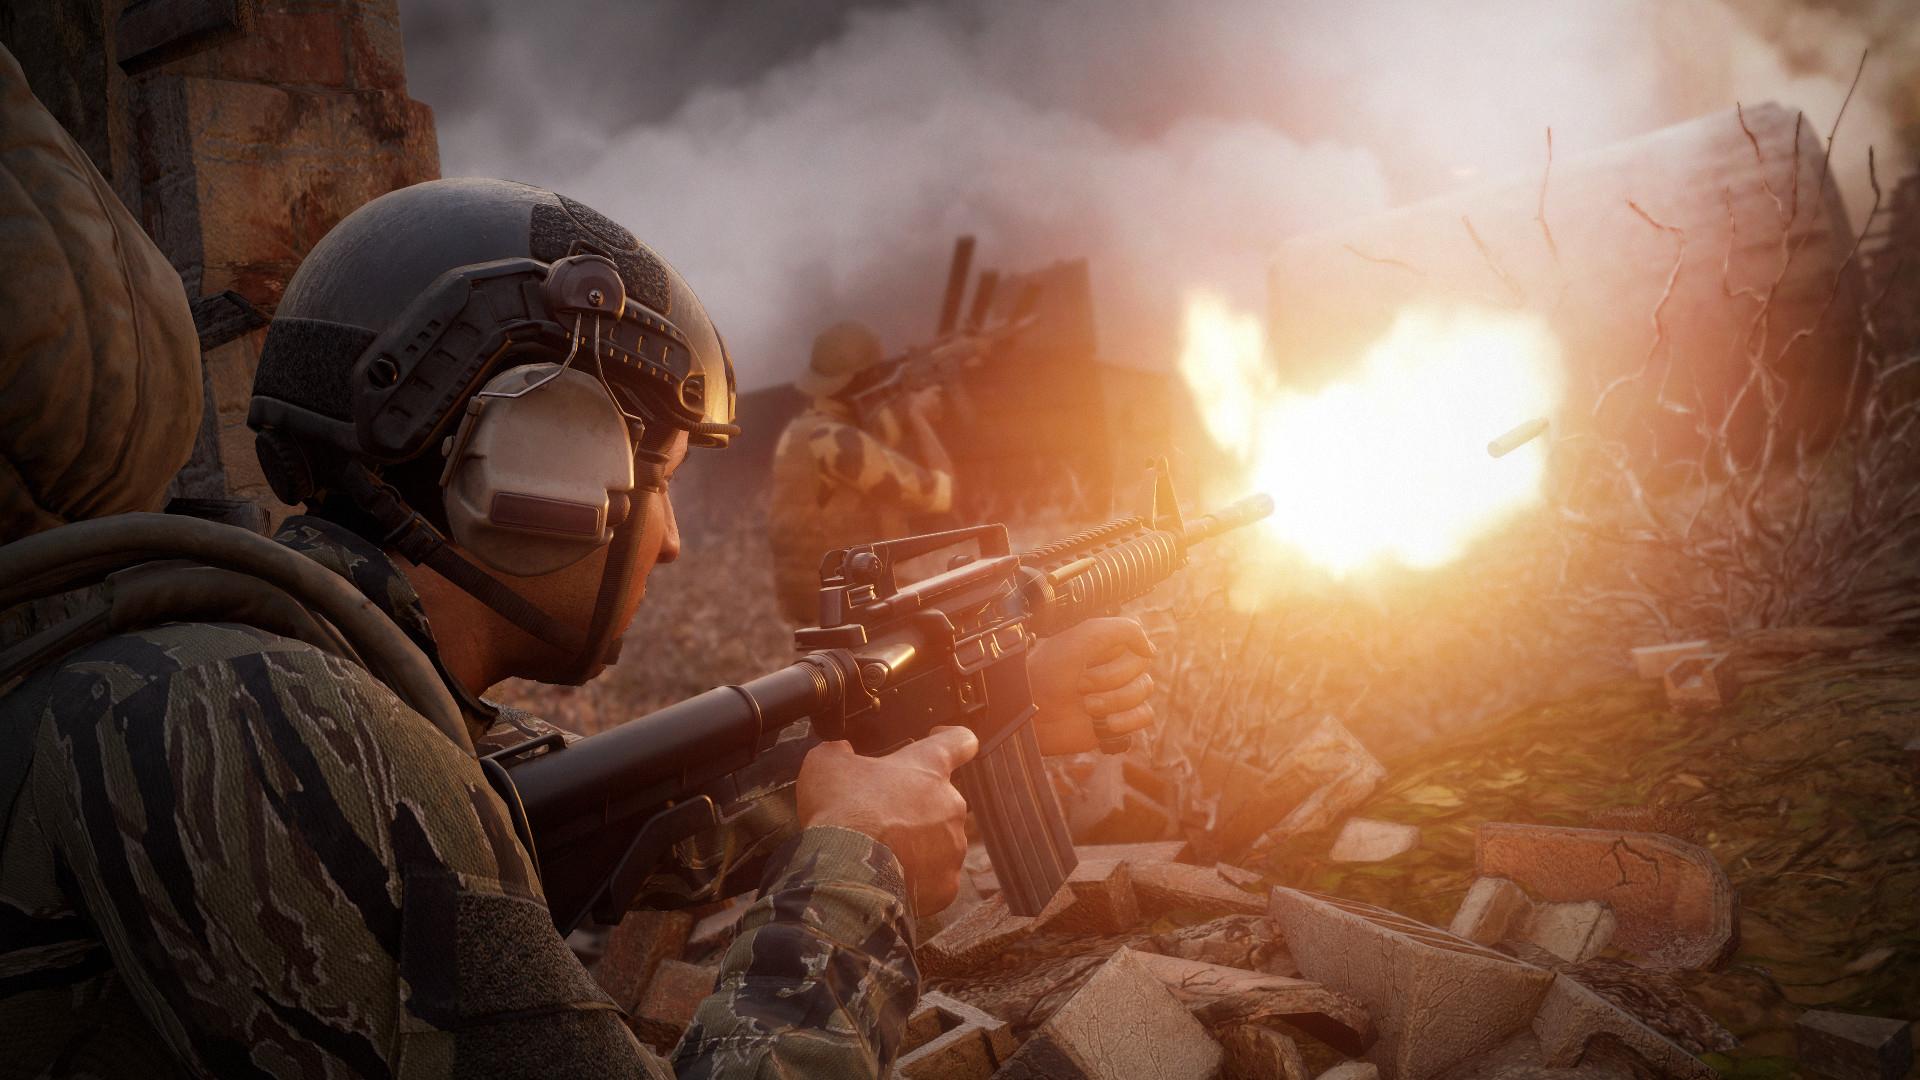 Juega gratis a Insurgency Sandstorm y World War 3 (Steam)